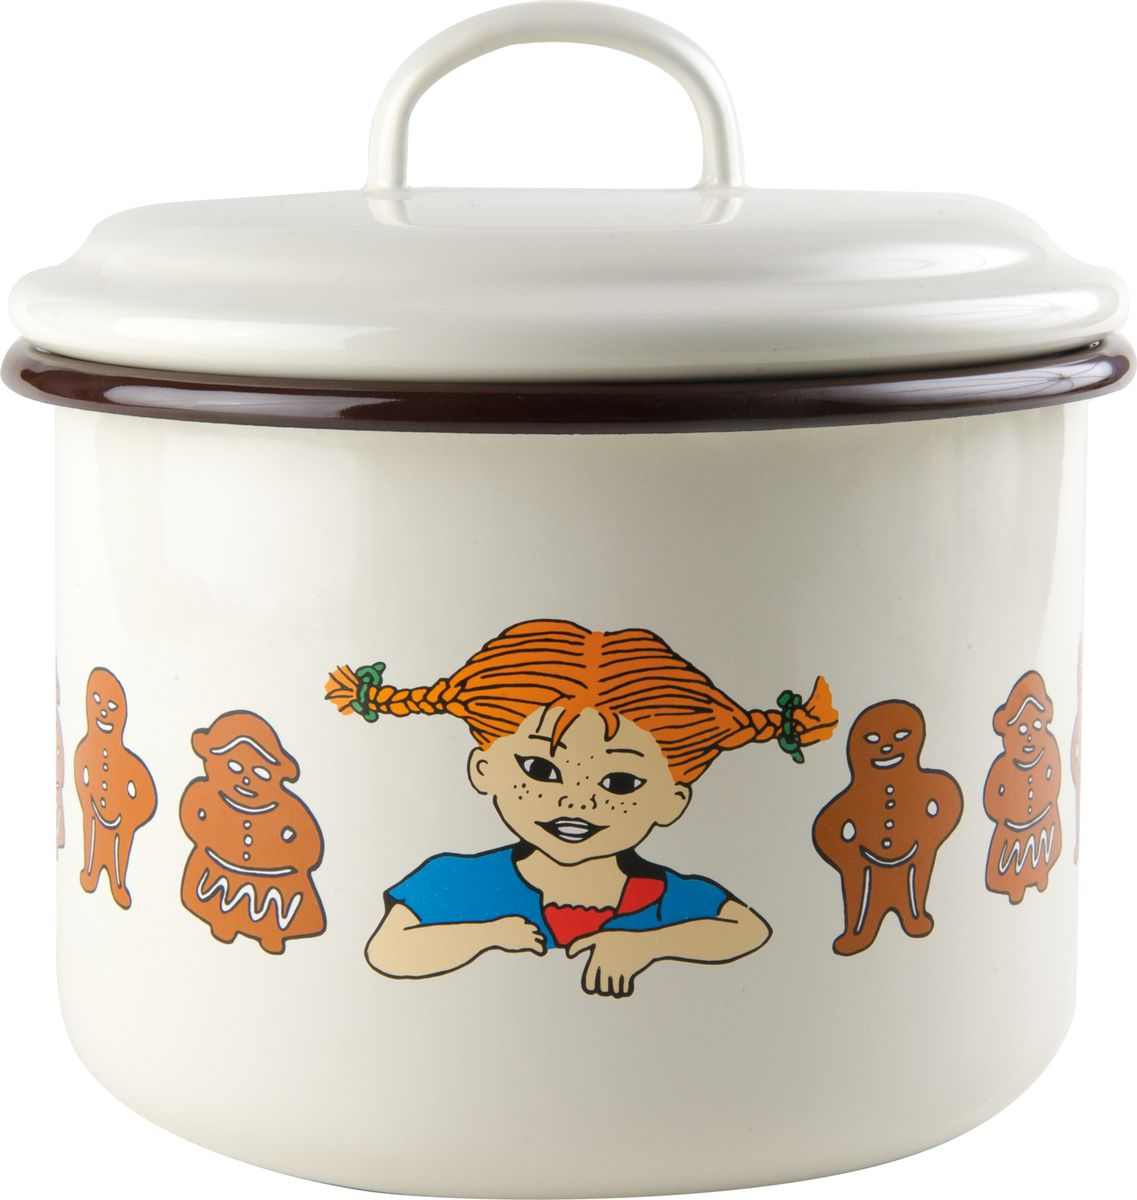 Банка для хранения Muurla Pippi Gingerbread, 2,3л the gingerbread man